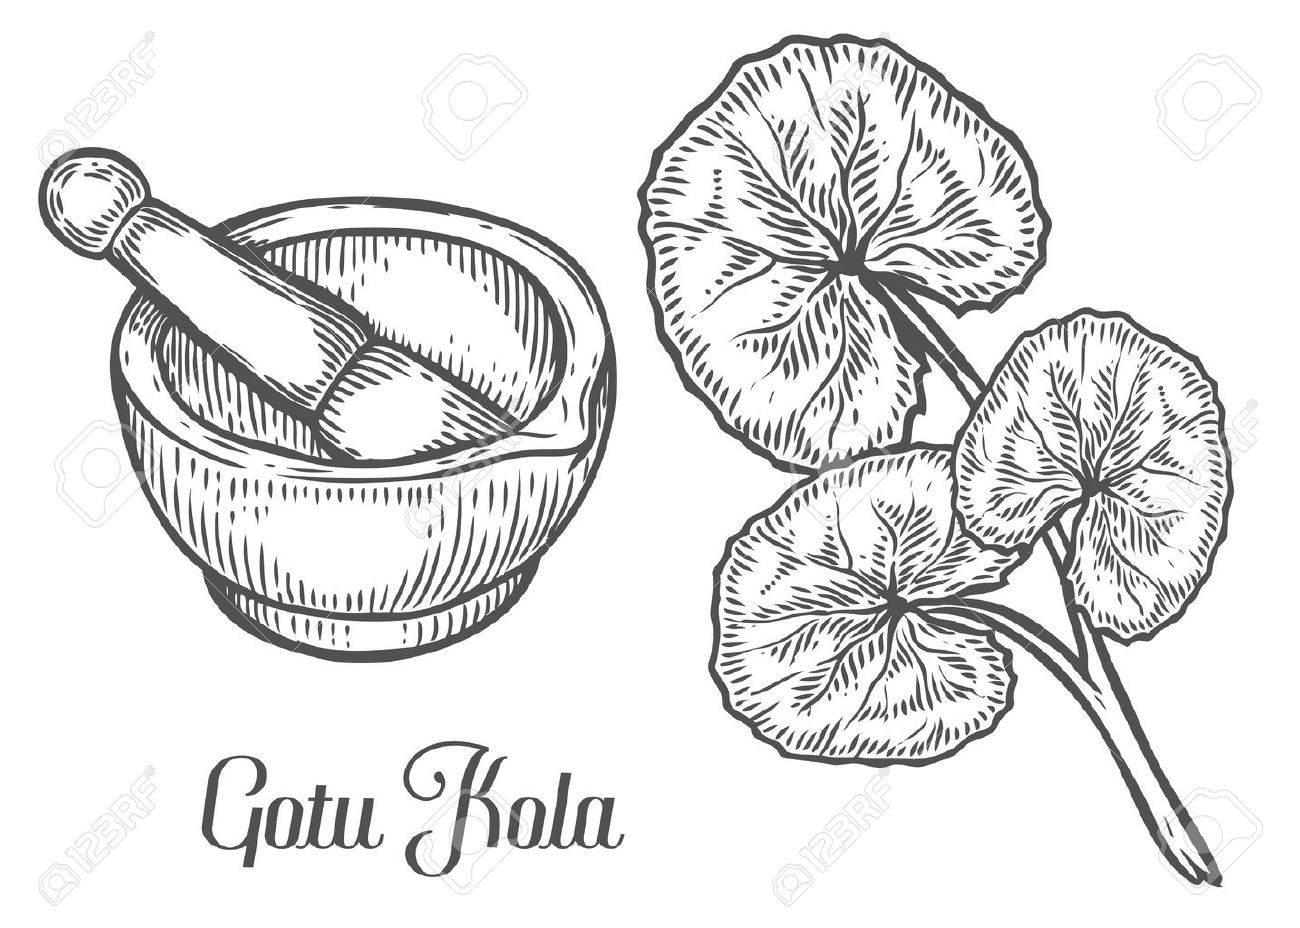 1300x928 Gotu Kola Plant With Mortar And Pestle. Black Isolated On White